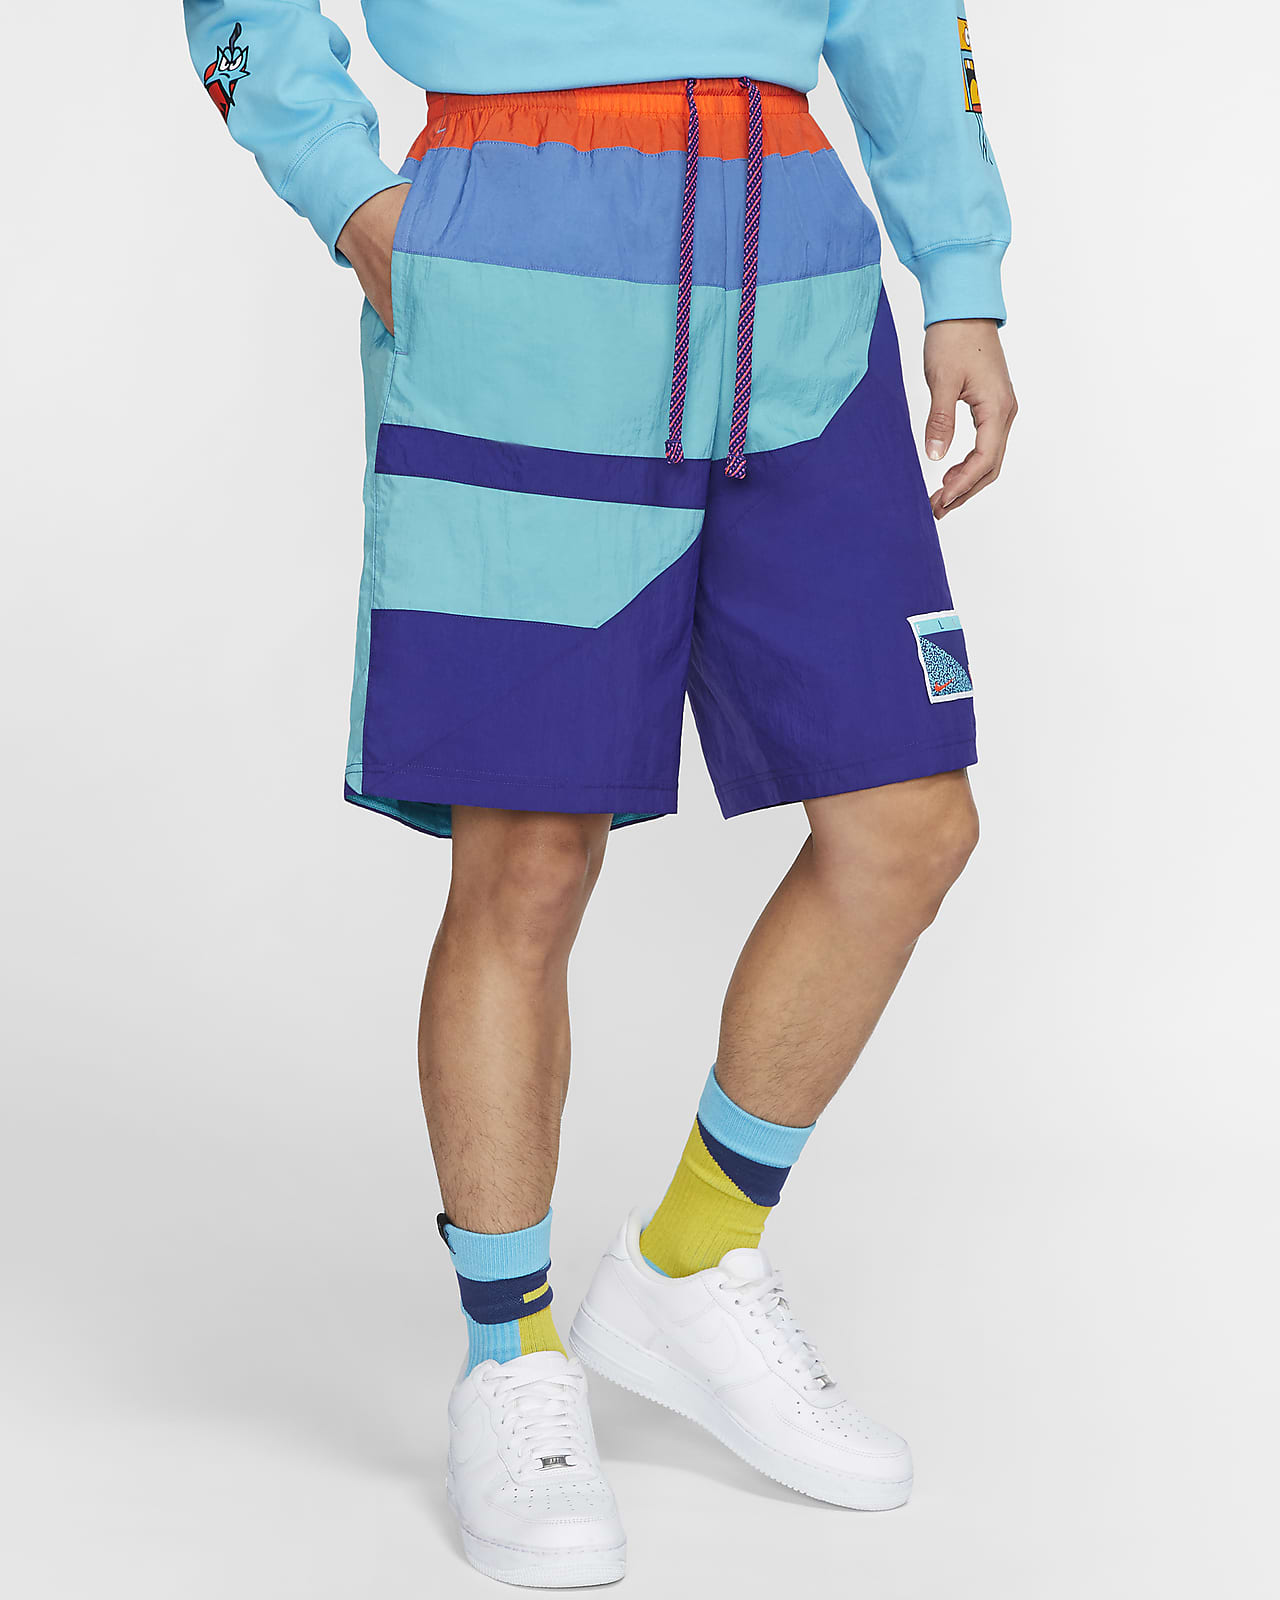 Basketshorts Nike Flight